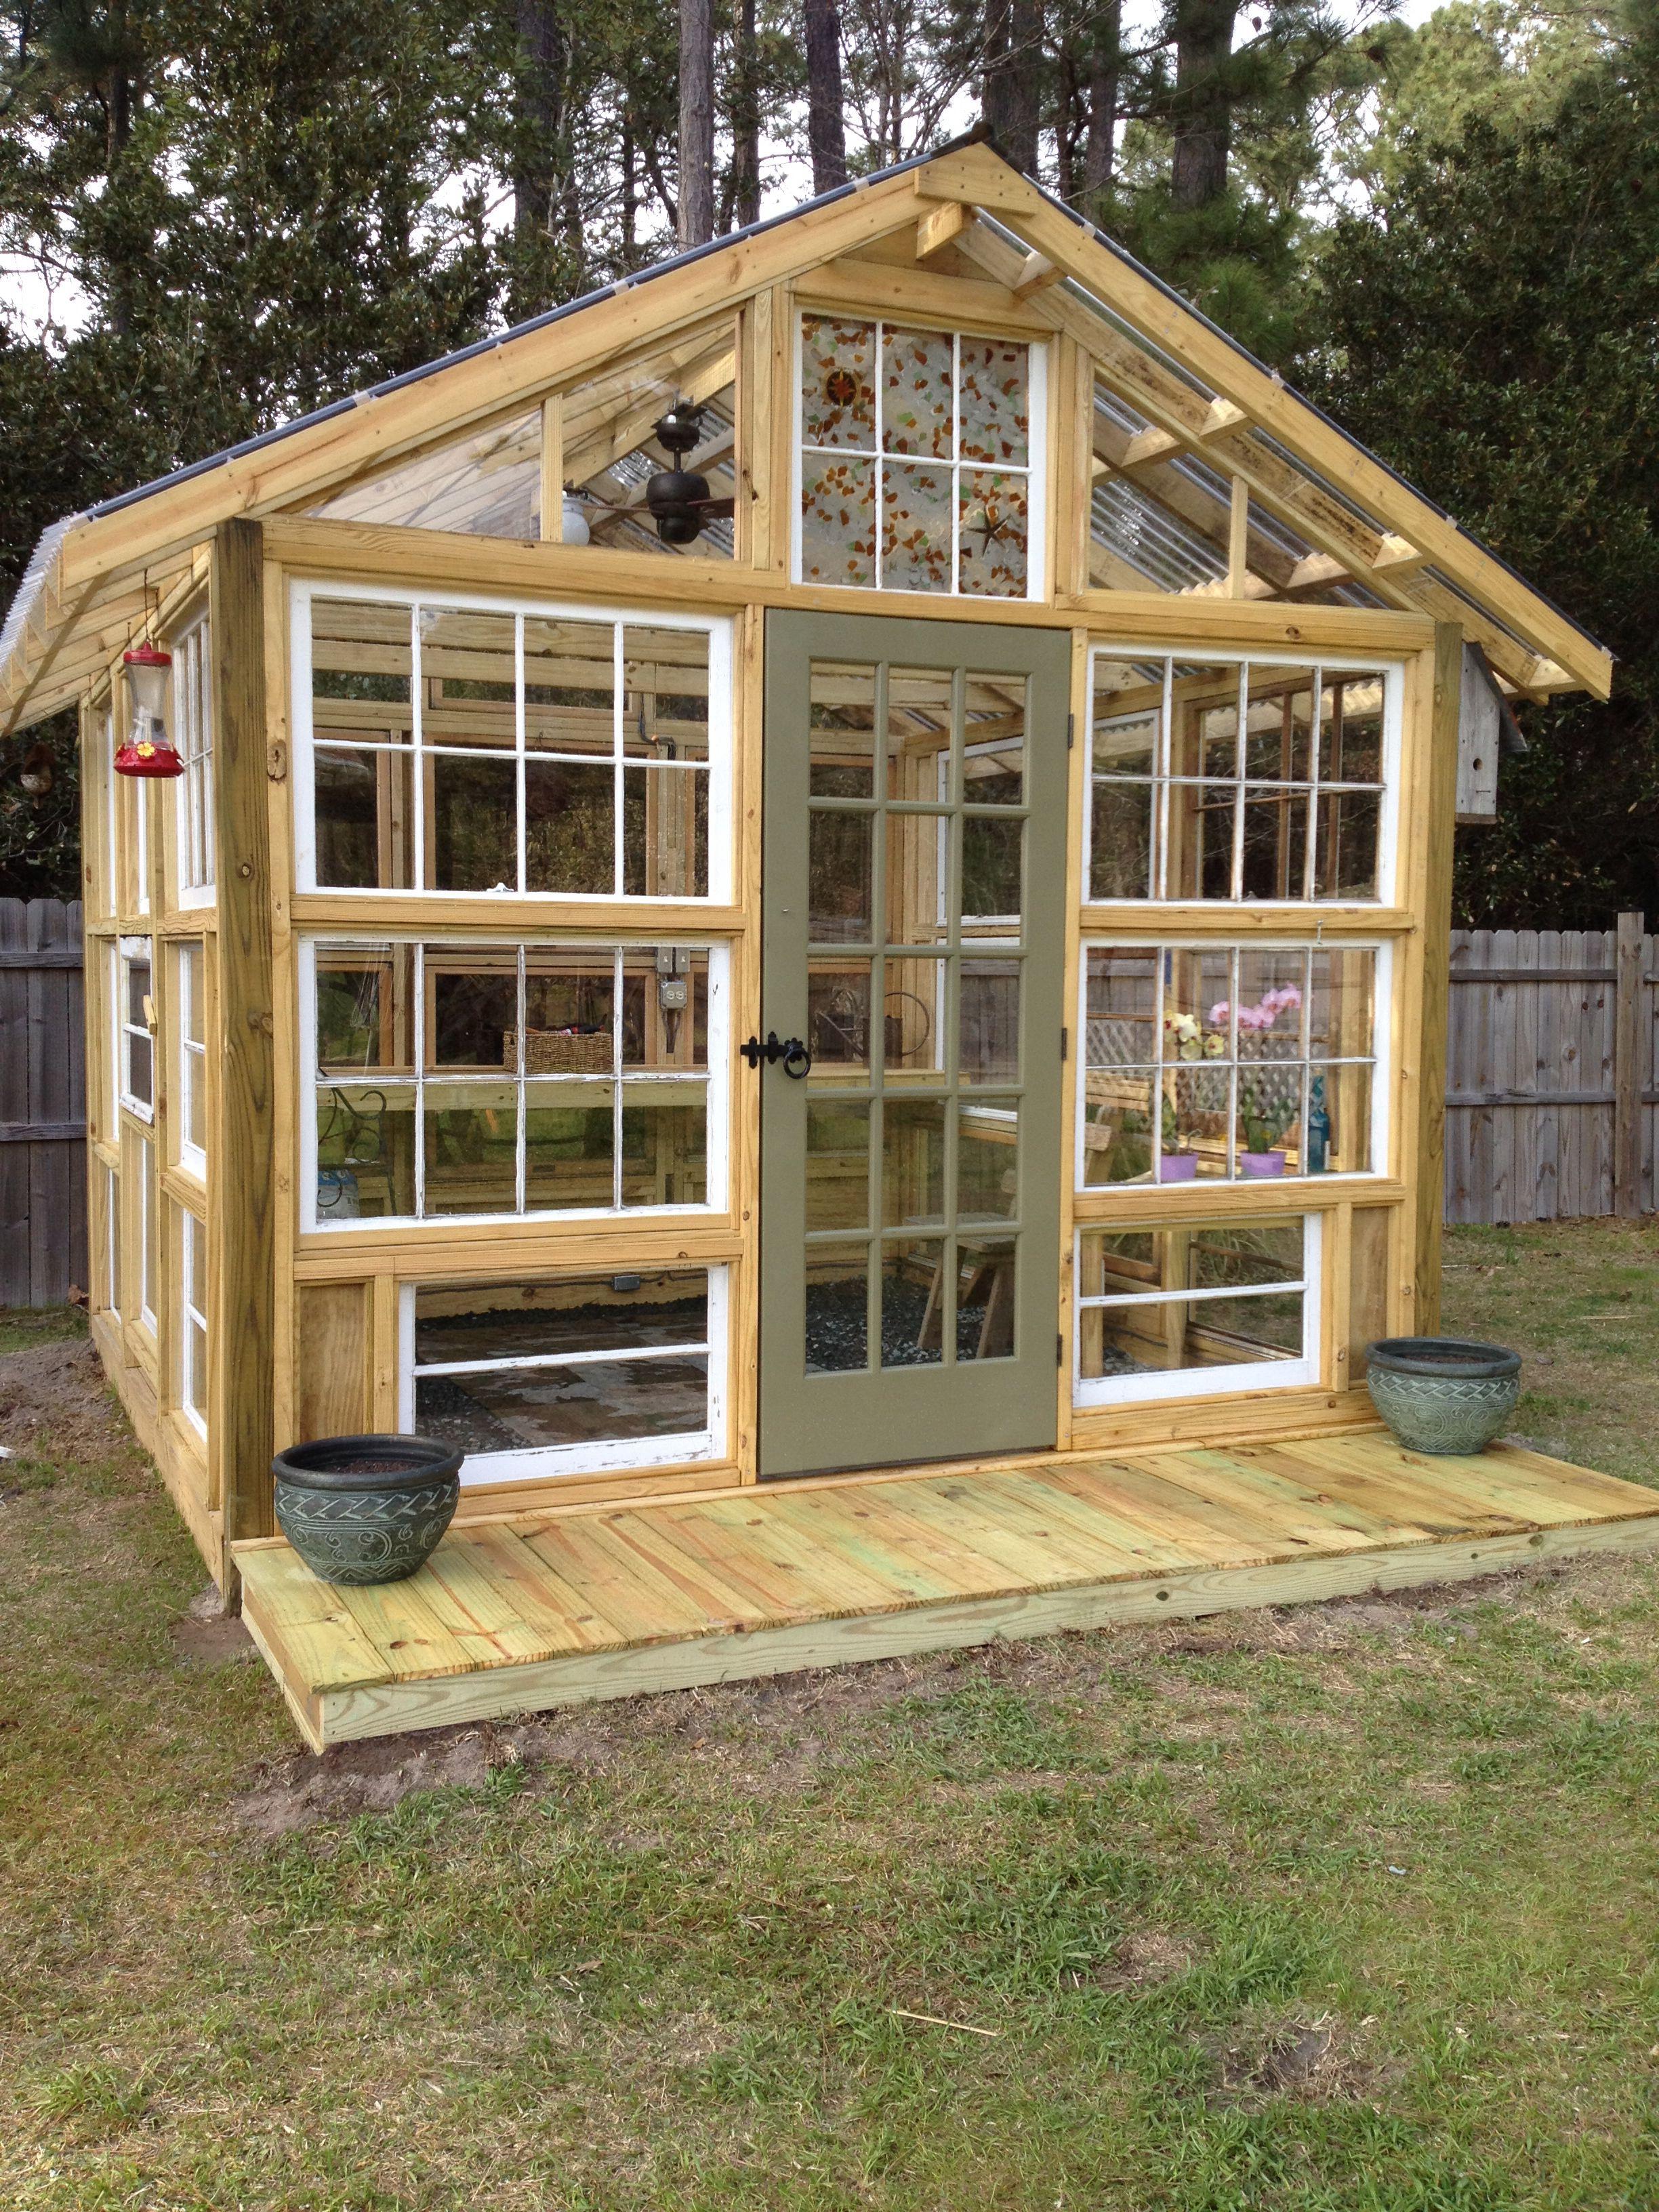 Green house made using old windows   Gardening   Pinterest ...